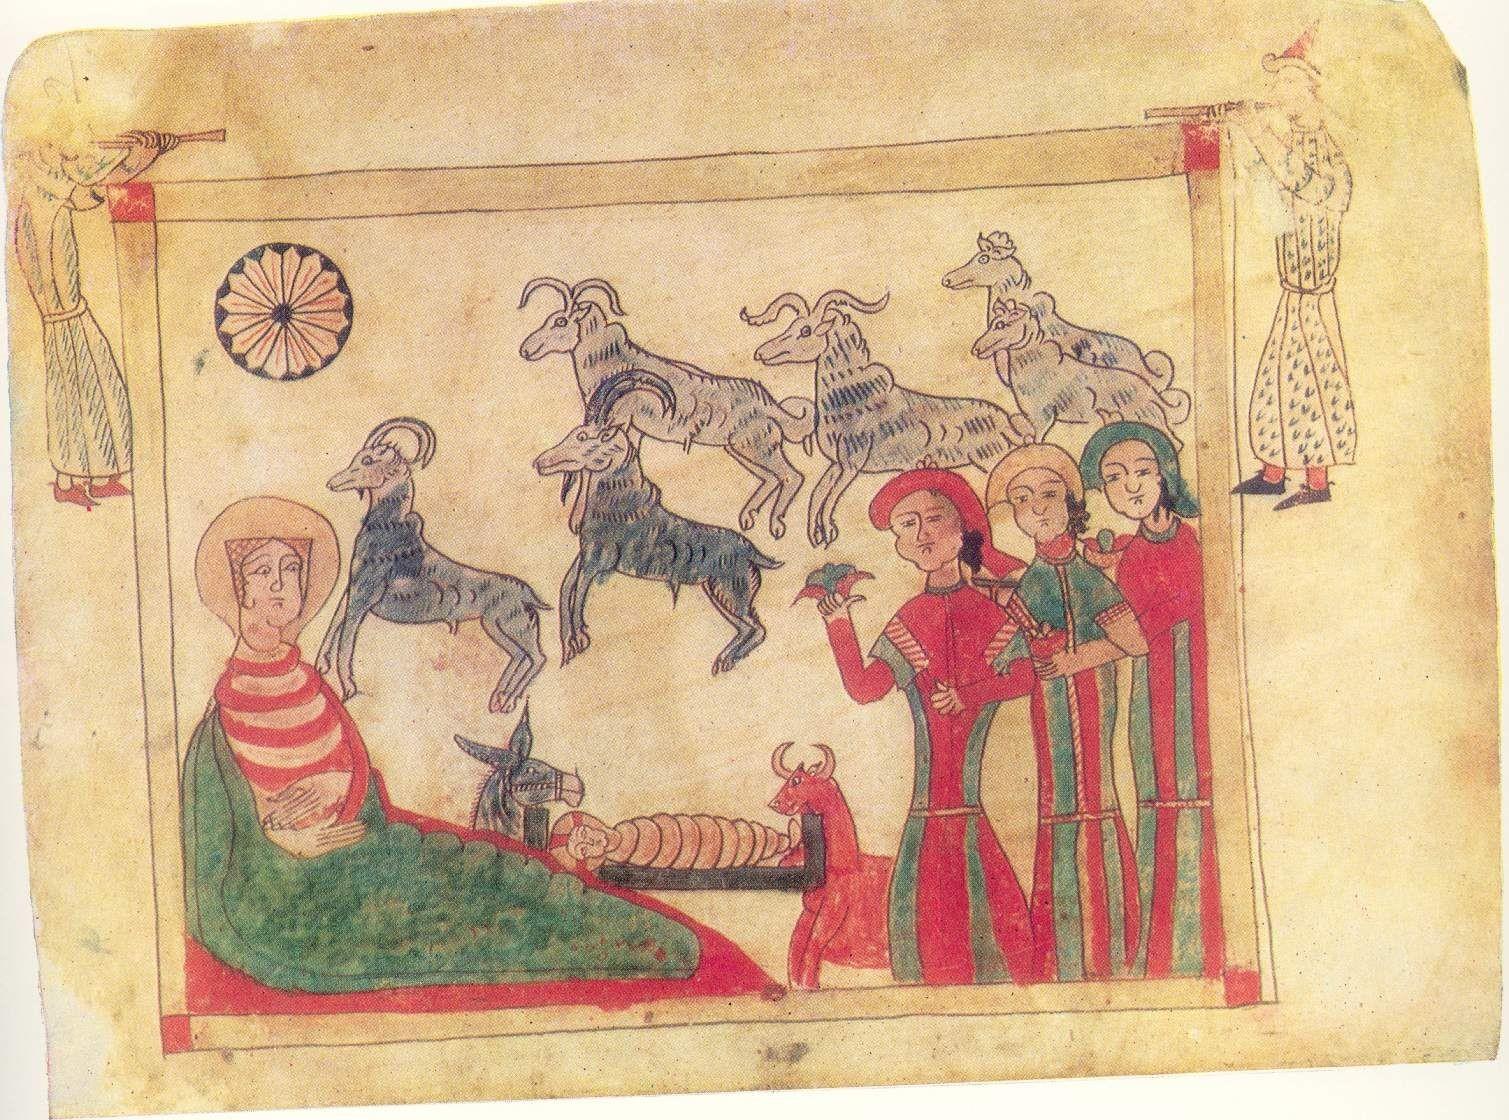 Мастер Мелхиседек. Миниатюра Евангелия. 1338г. Институт древних рукописей Матенадаран, Ереван, Армения